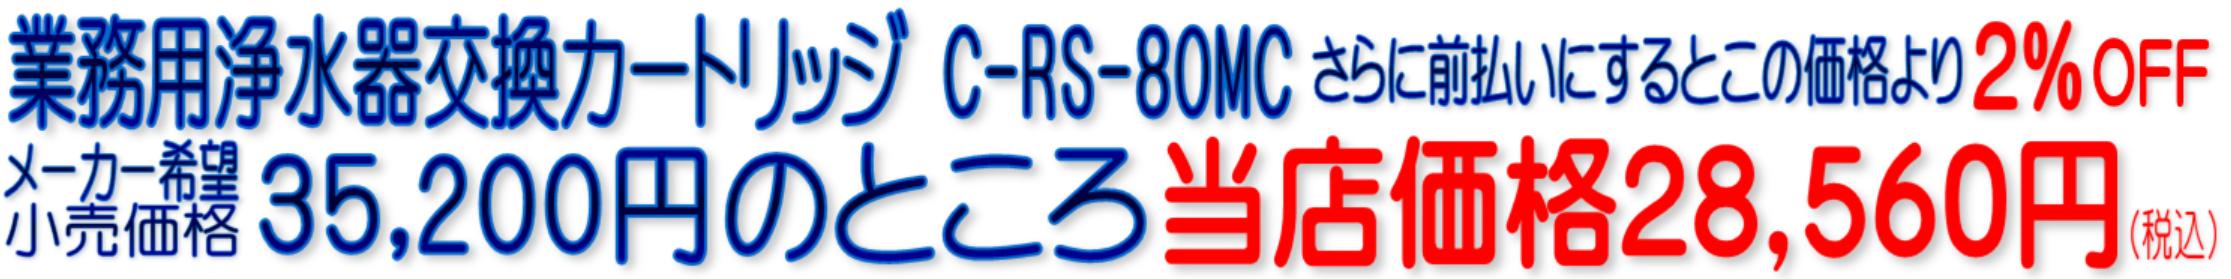 C-RS-80MC